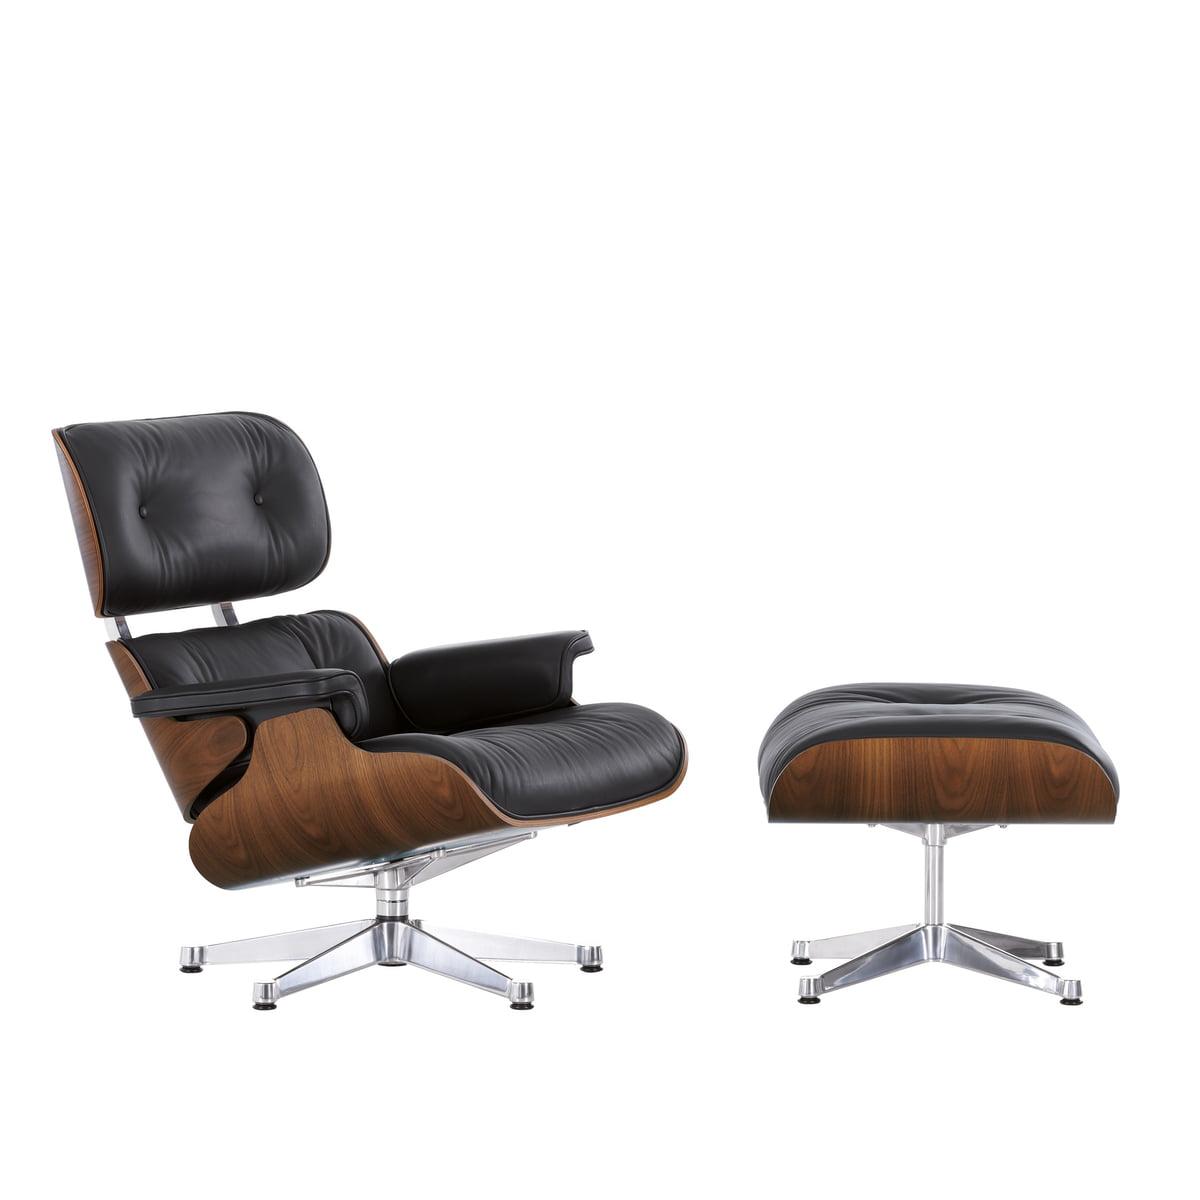 Vitra lounge chair i sort valn d i butikken for Vitra lounge chair nachbau